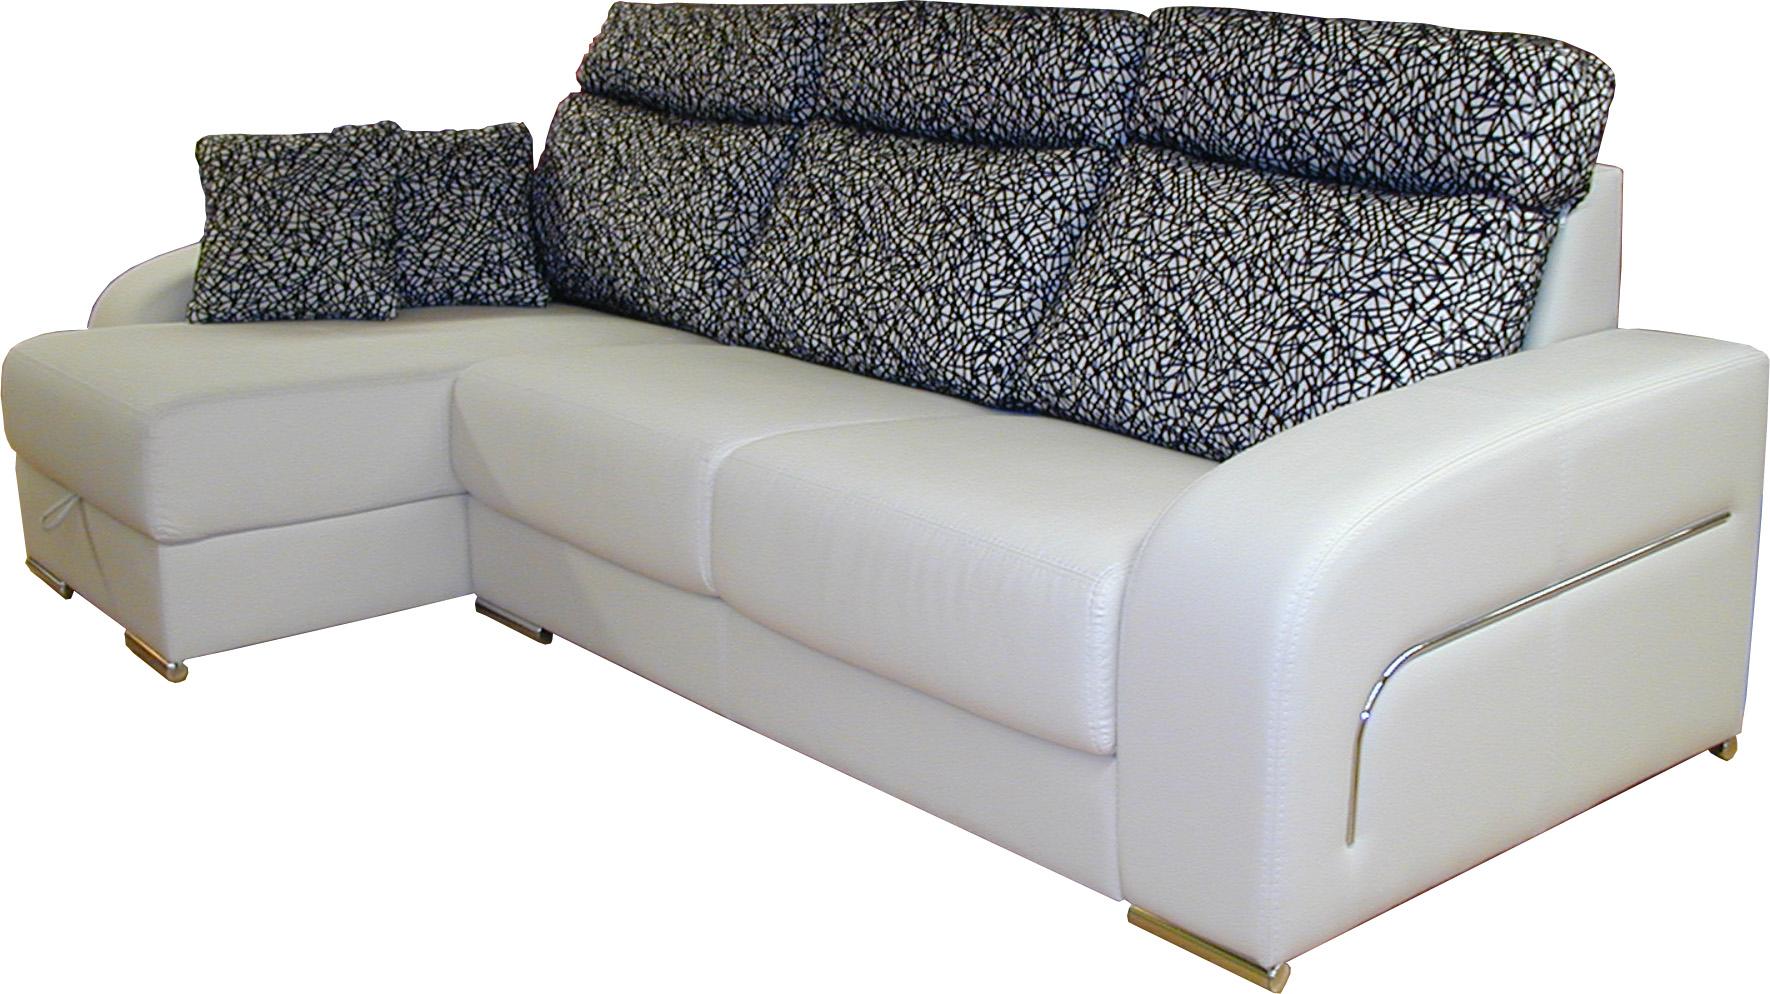 Sofa chaise longue deslizante zeus obtenez for Sofa arcon jardin